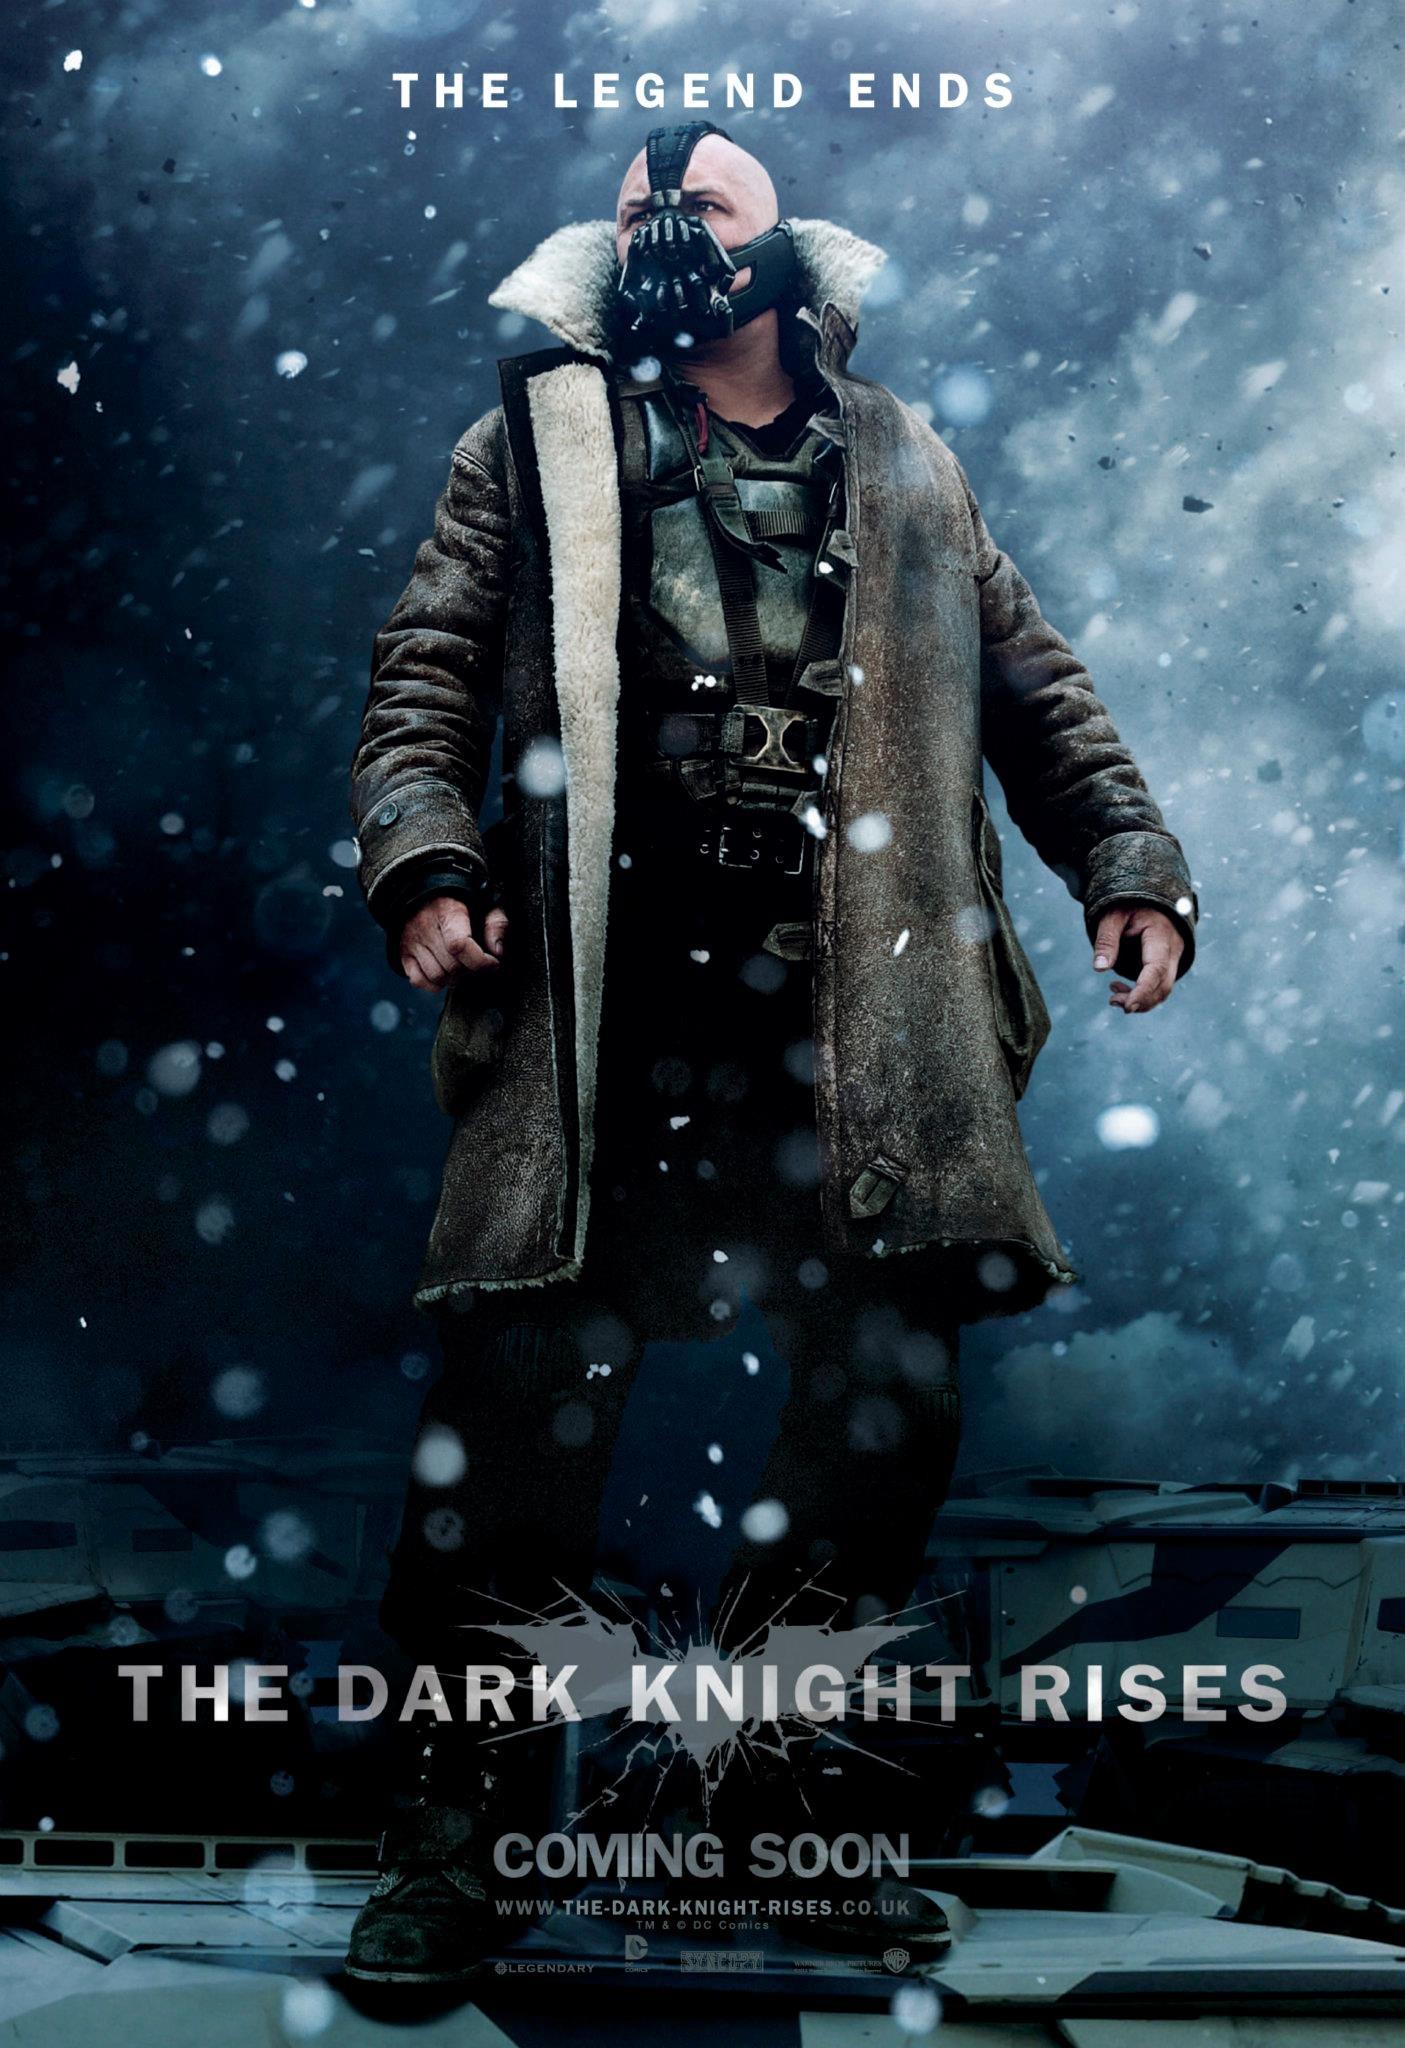 The Dark Knight Rises - Bane poster